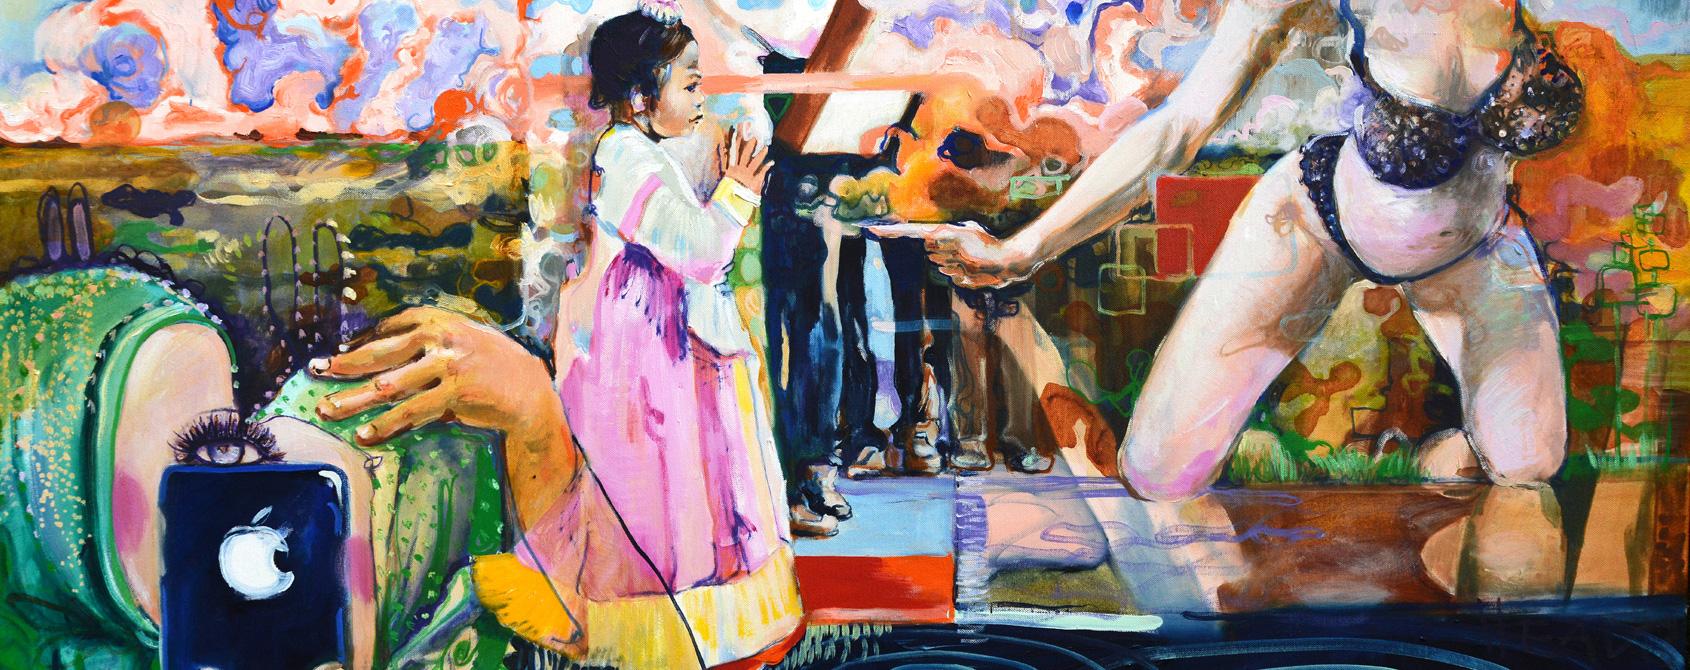 Arab Spring von Serge Nyfeler